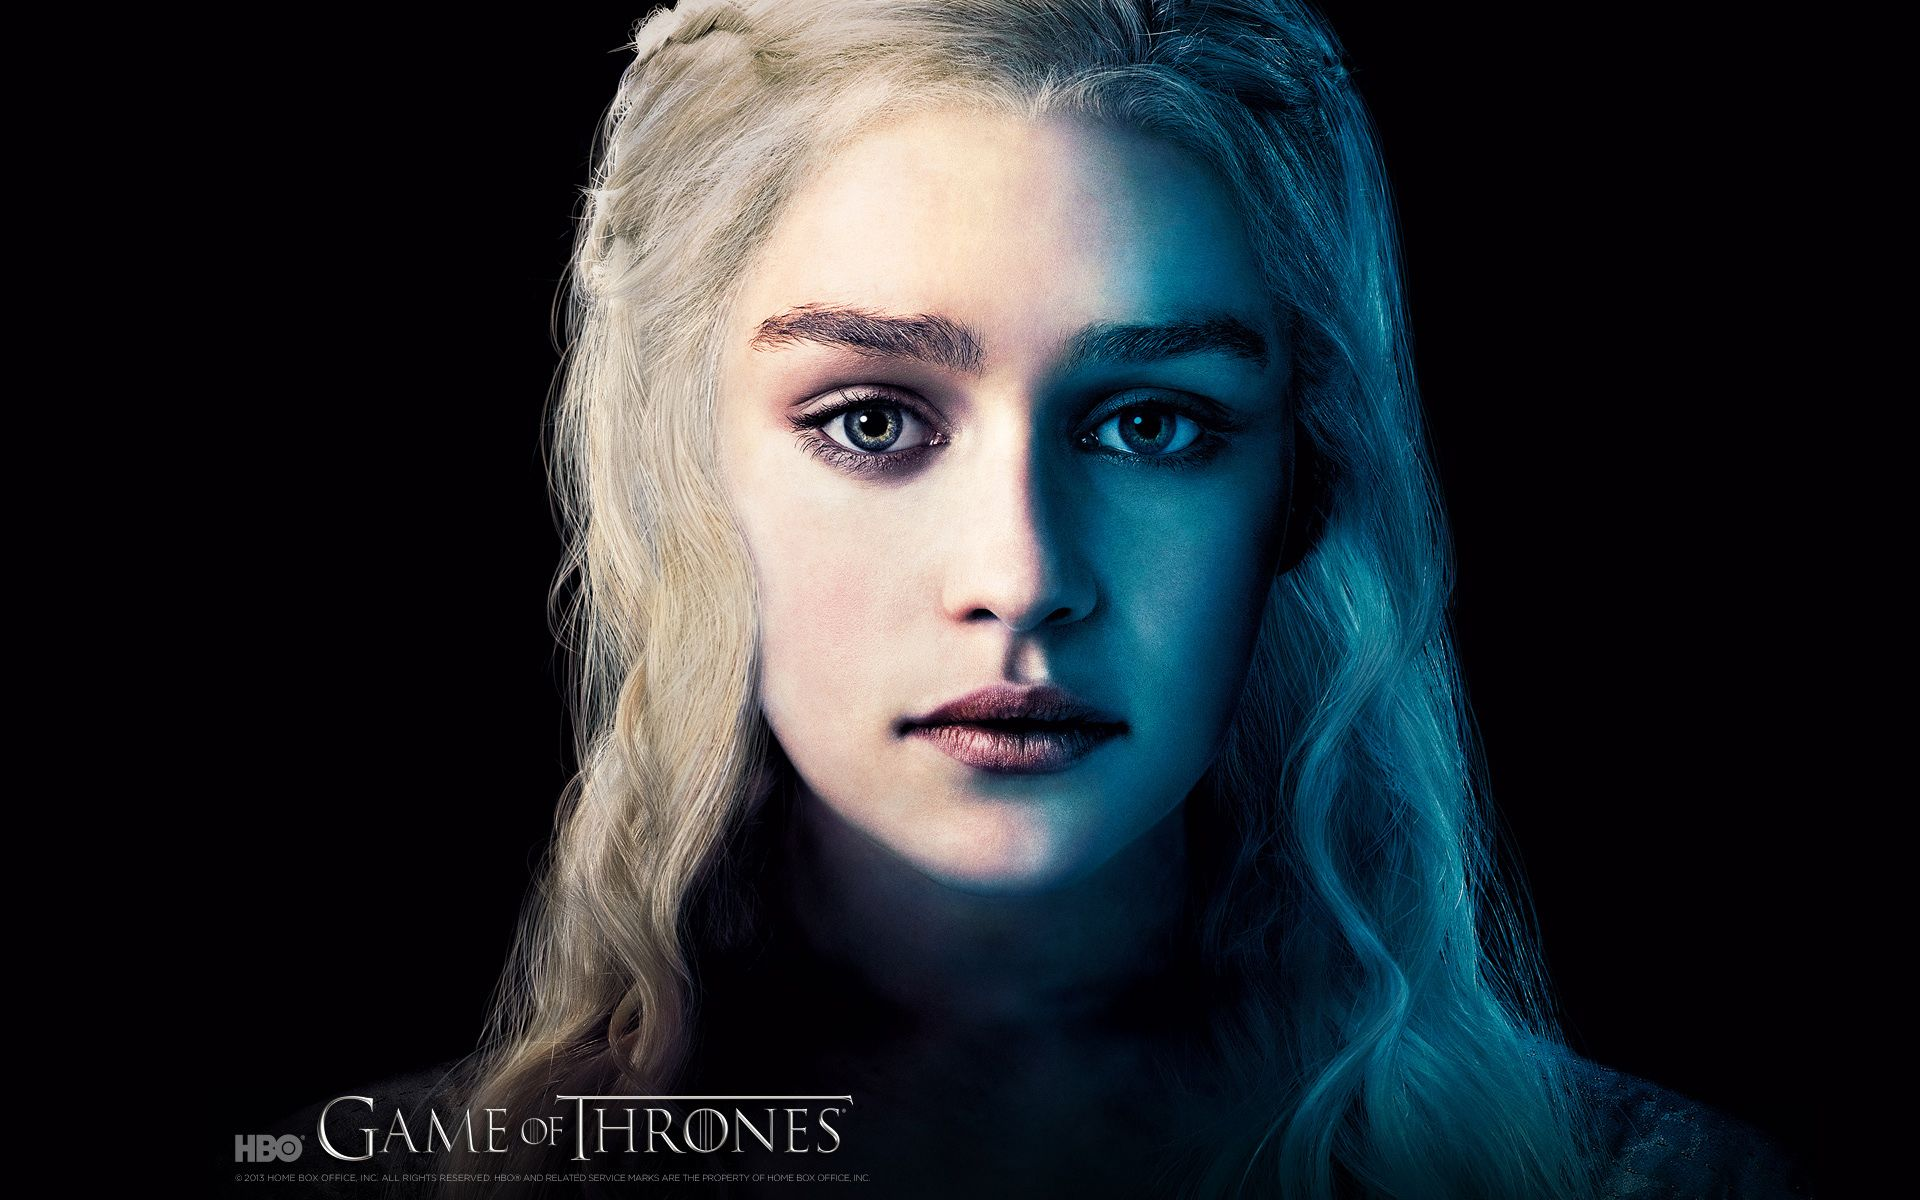 Game Of Thrones Season 3 Bites Game Of Thrones Season 3 Clarke Game Of Thrones Emilia Clarke Game Of Throne Daenerys